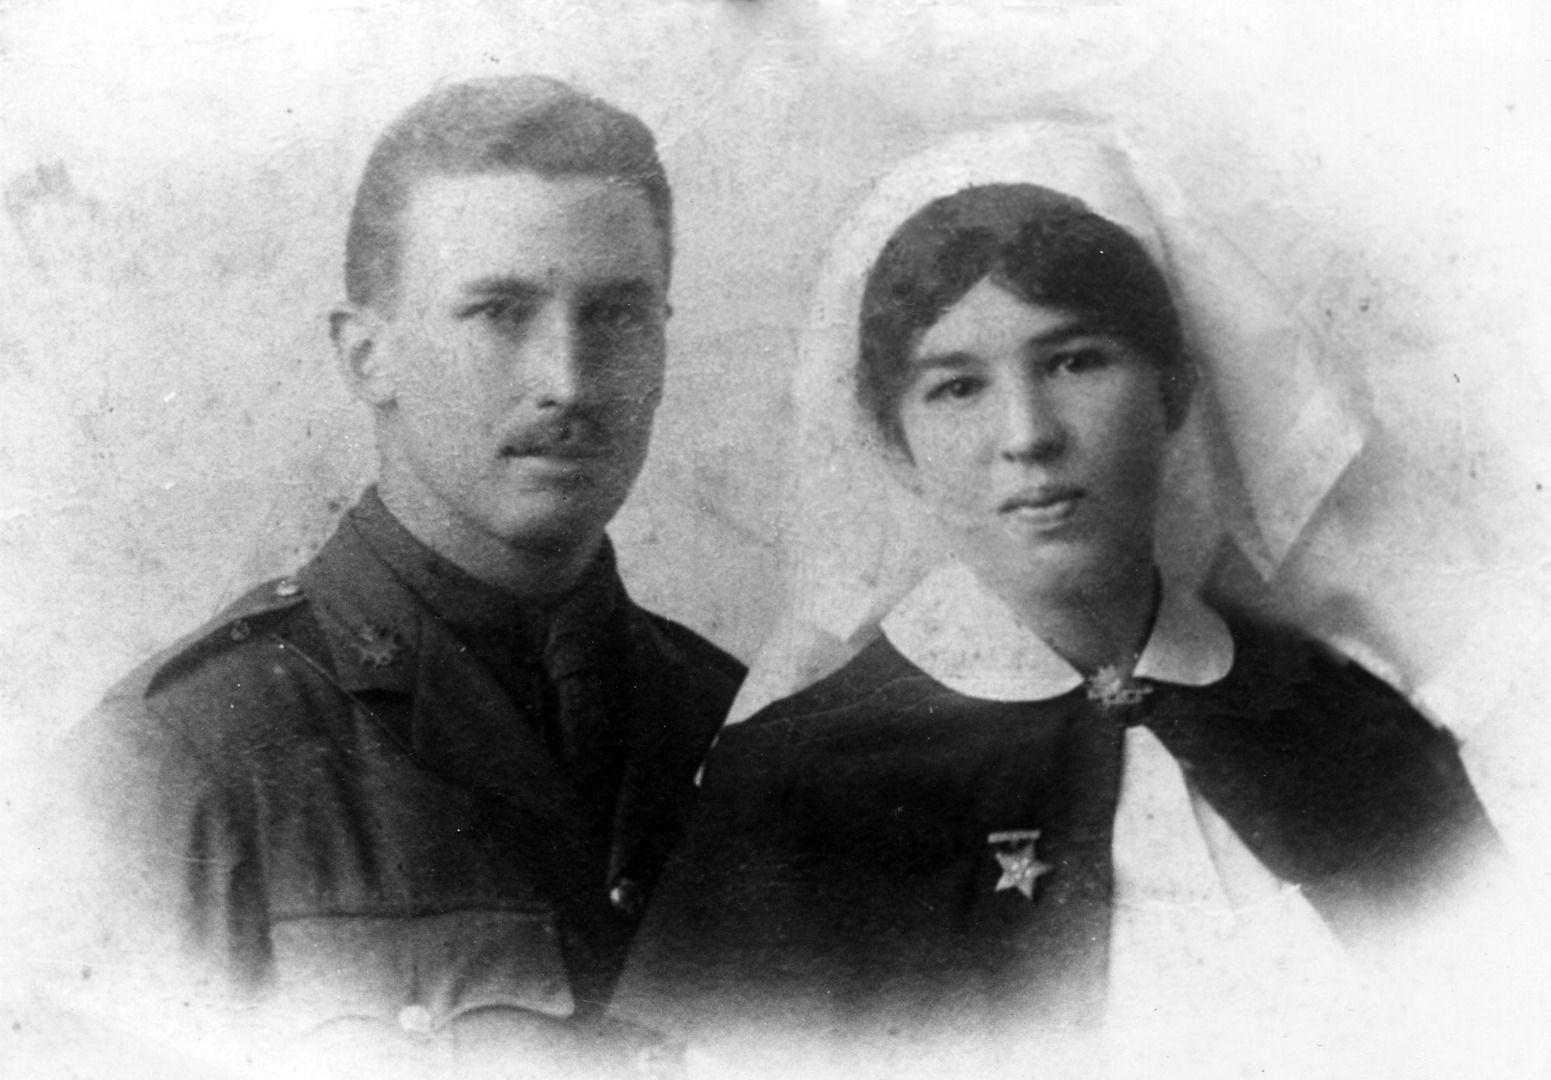 Sister Hilda Mary Steele WW1 a New Zealander in the